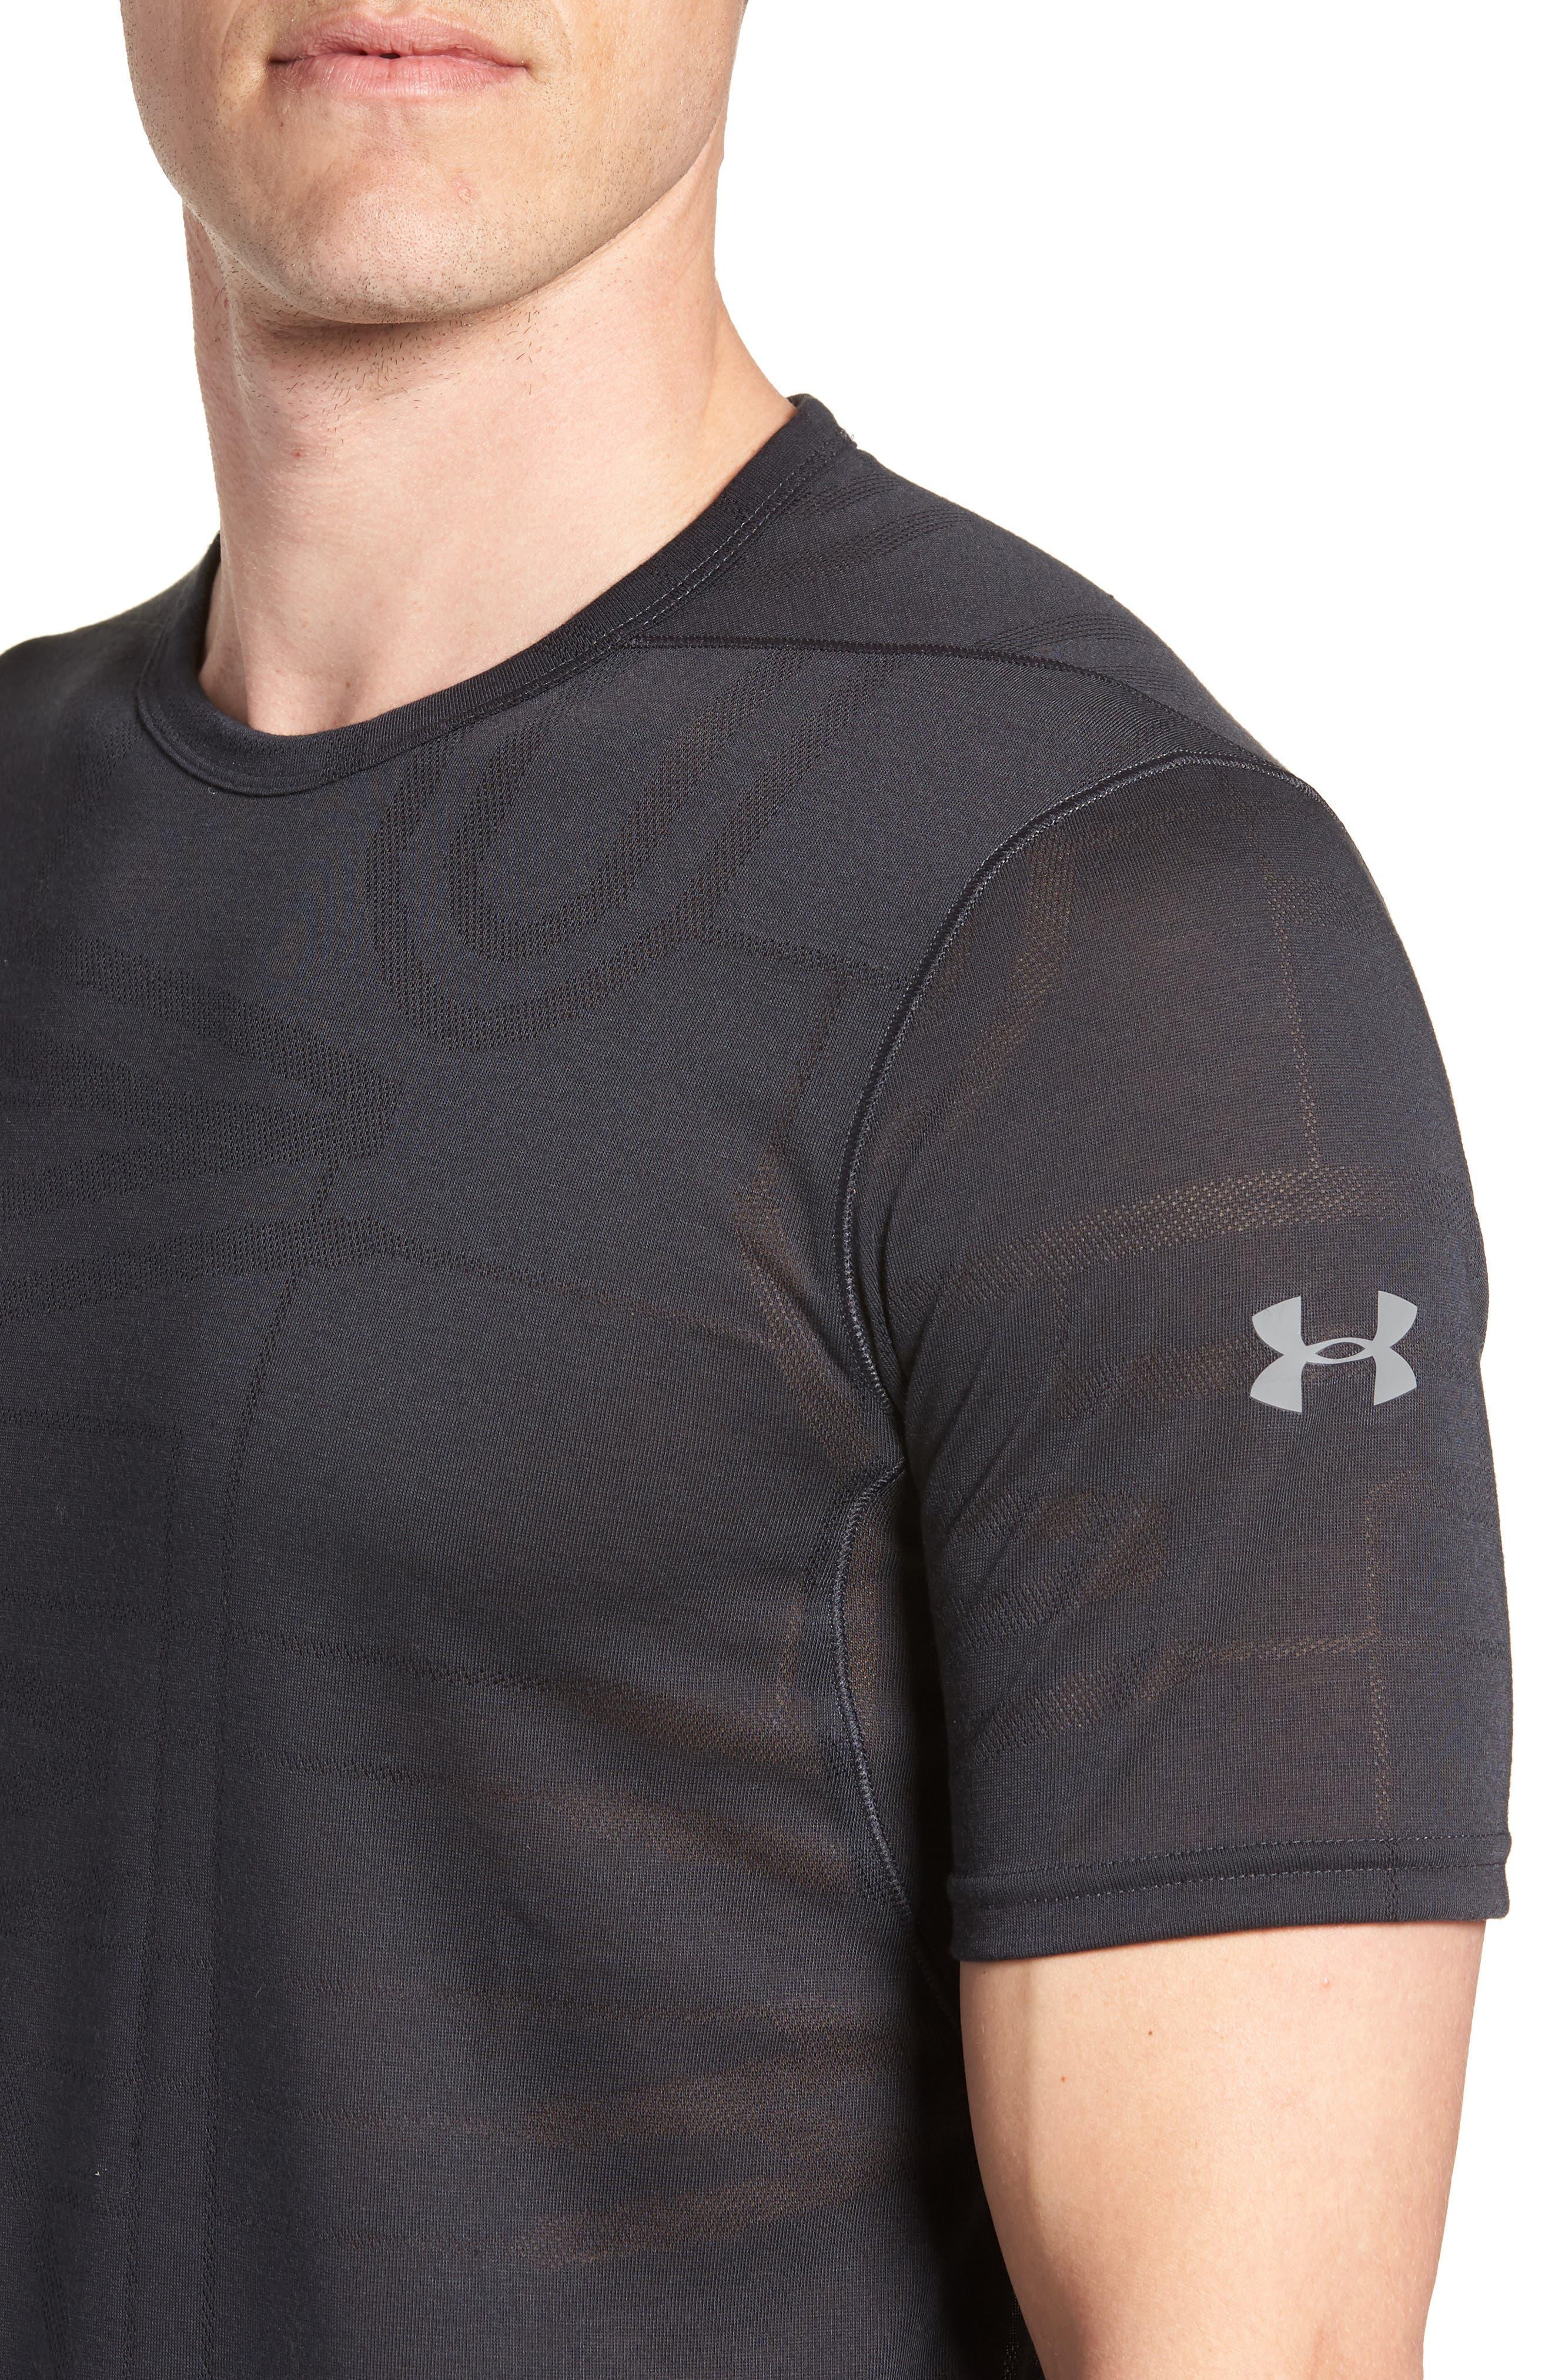 Threadborne Elite Crewneck T-Shirt,                             Alternate thumbnail 4, color,                             BLACK/ GRAPHITE